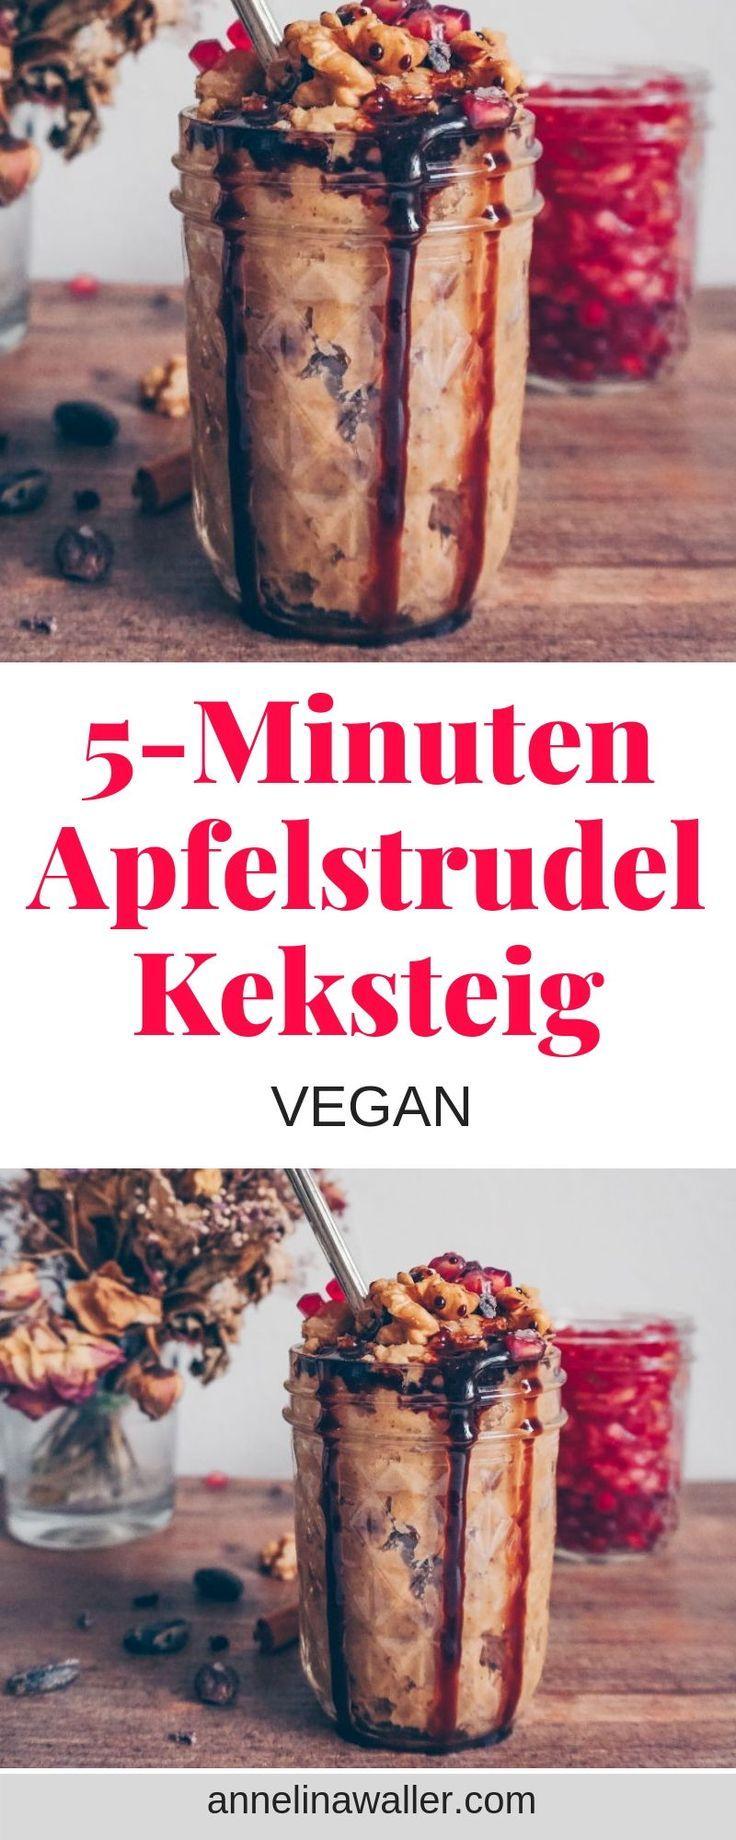 5 Zutaten 5 Minuten Apfelstrudel Keksteig #veganerezepte